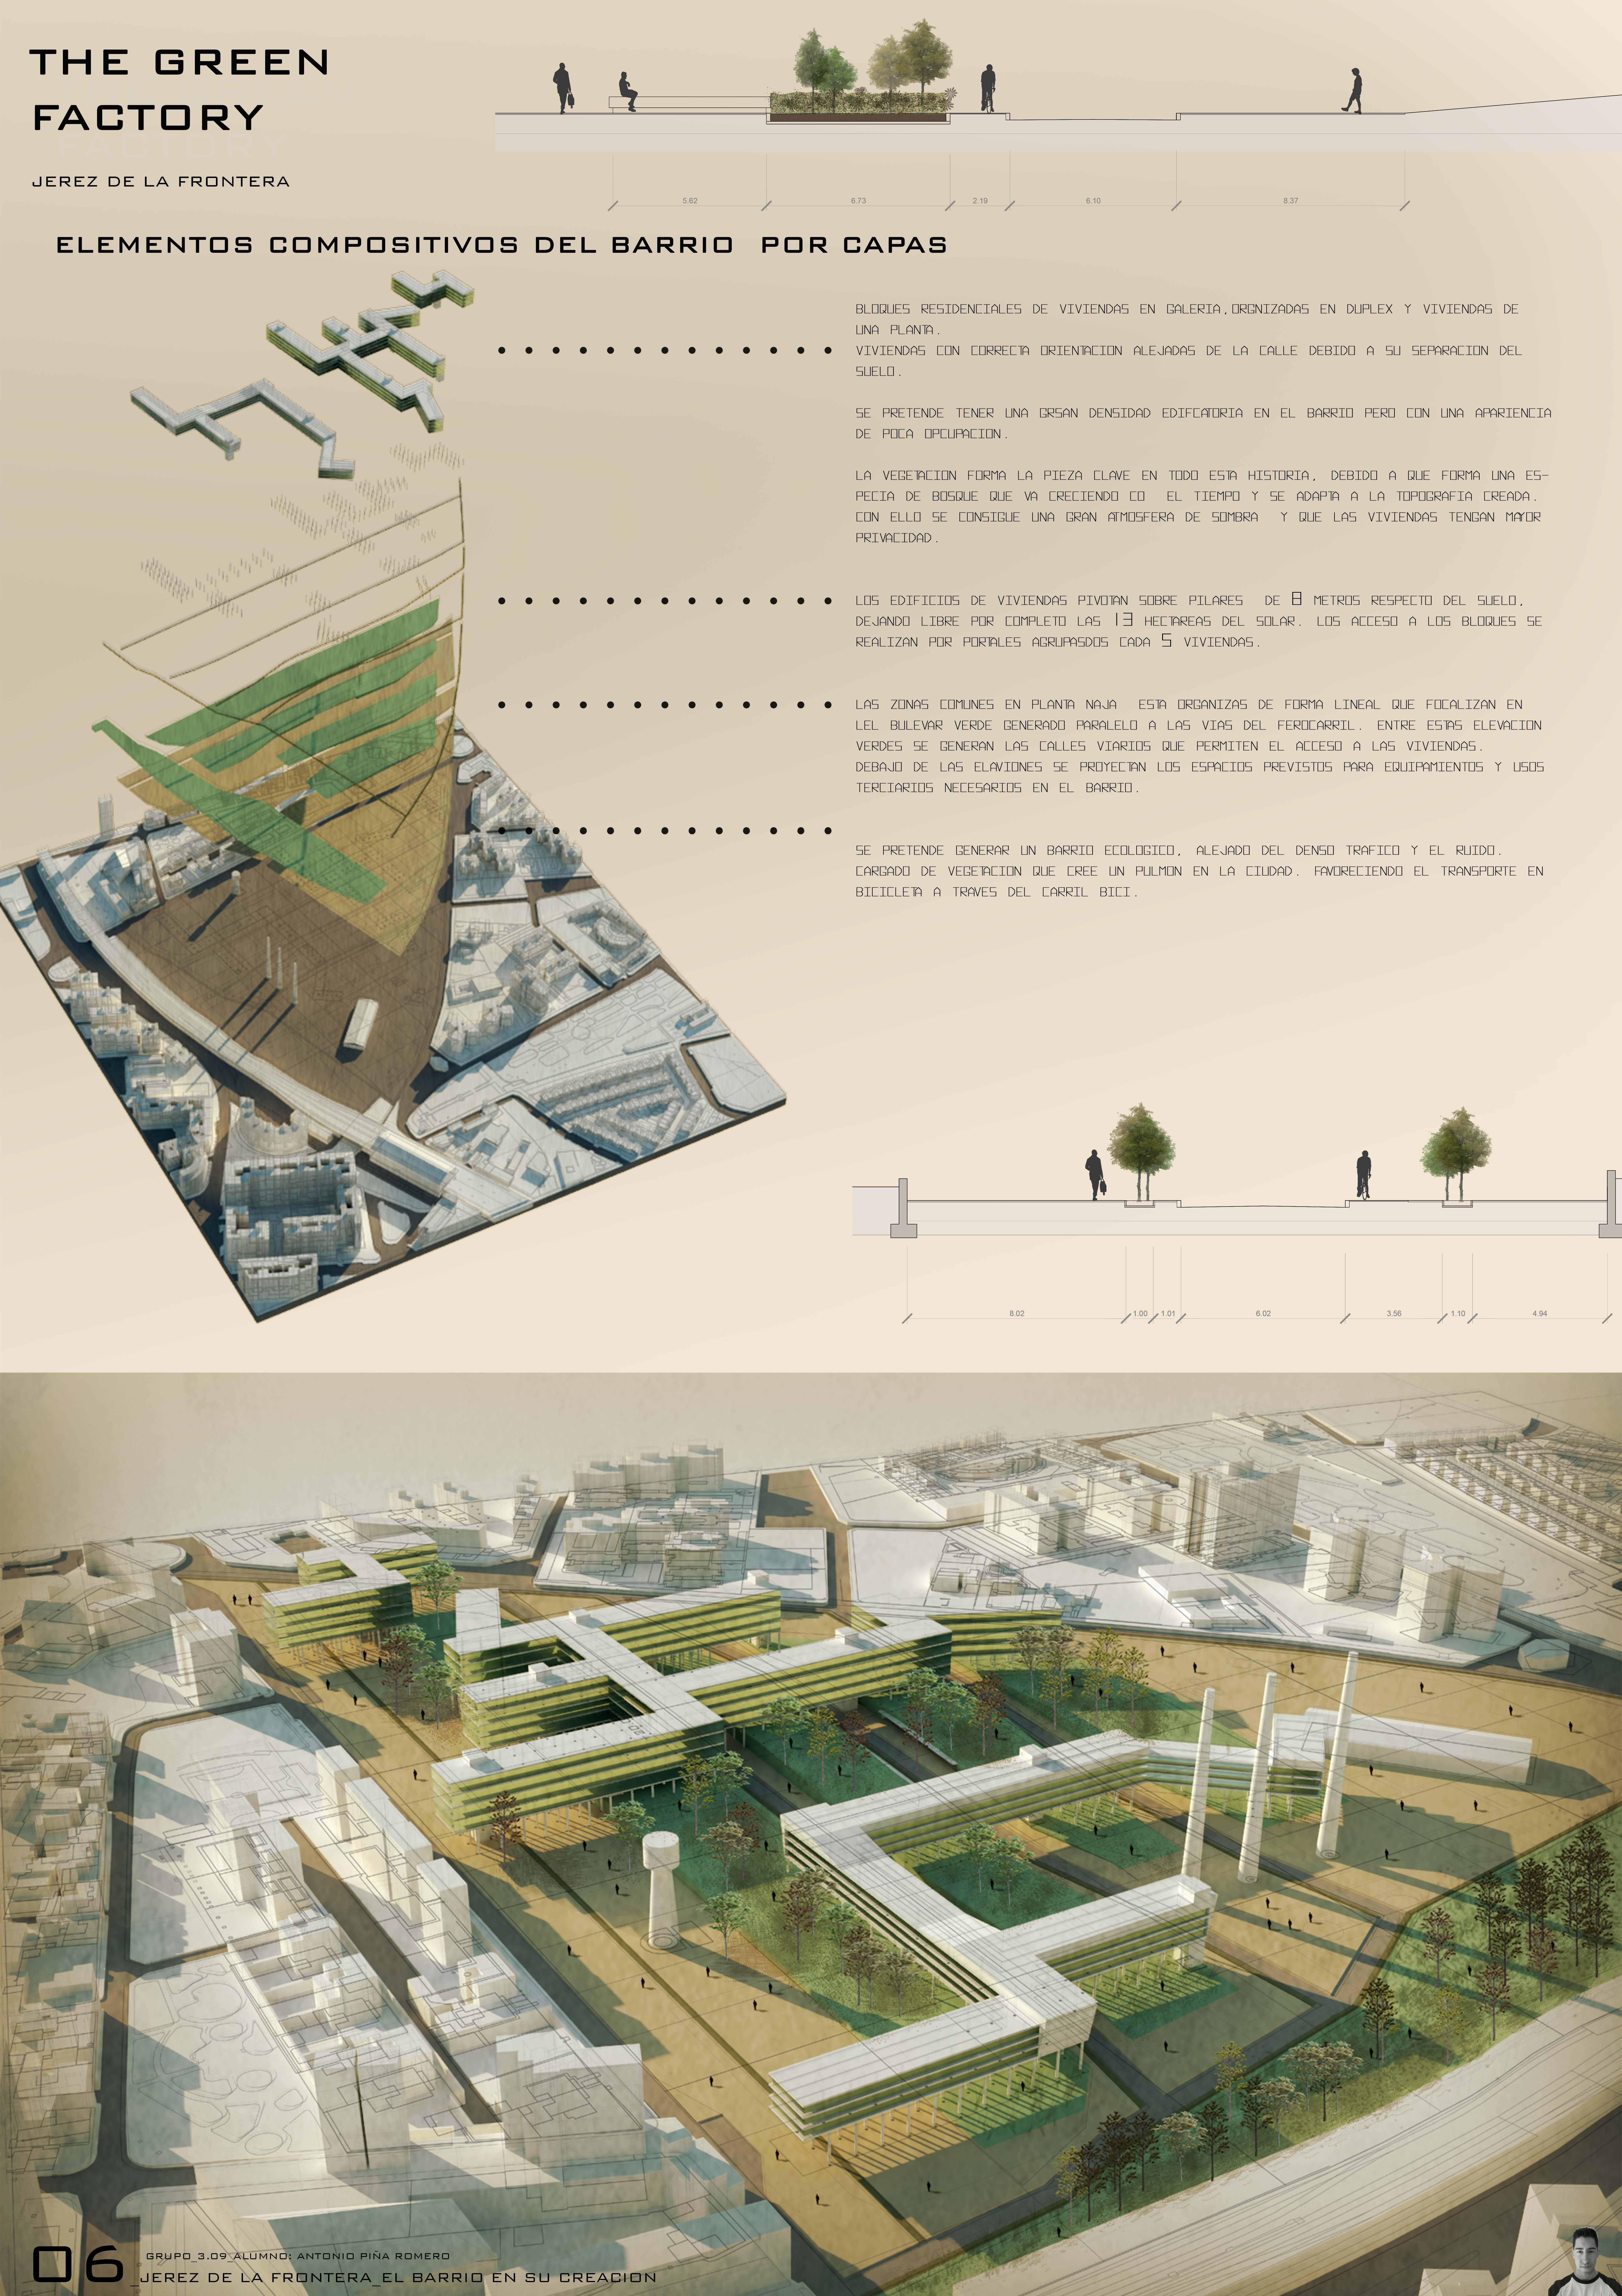 #Architecture #3D #design #urbanism #plan #planning #graph